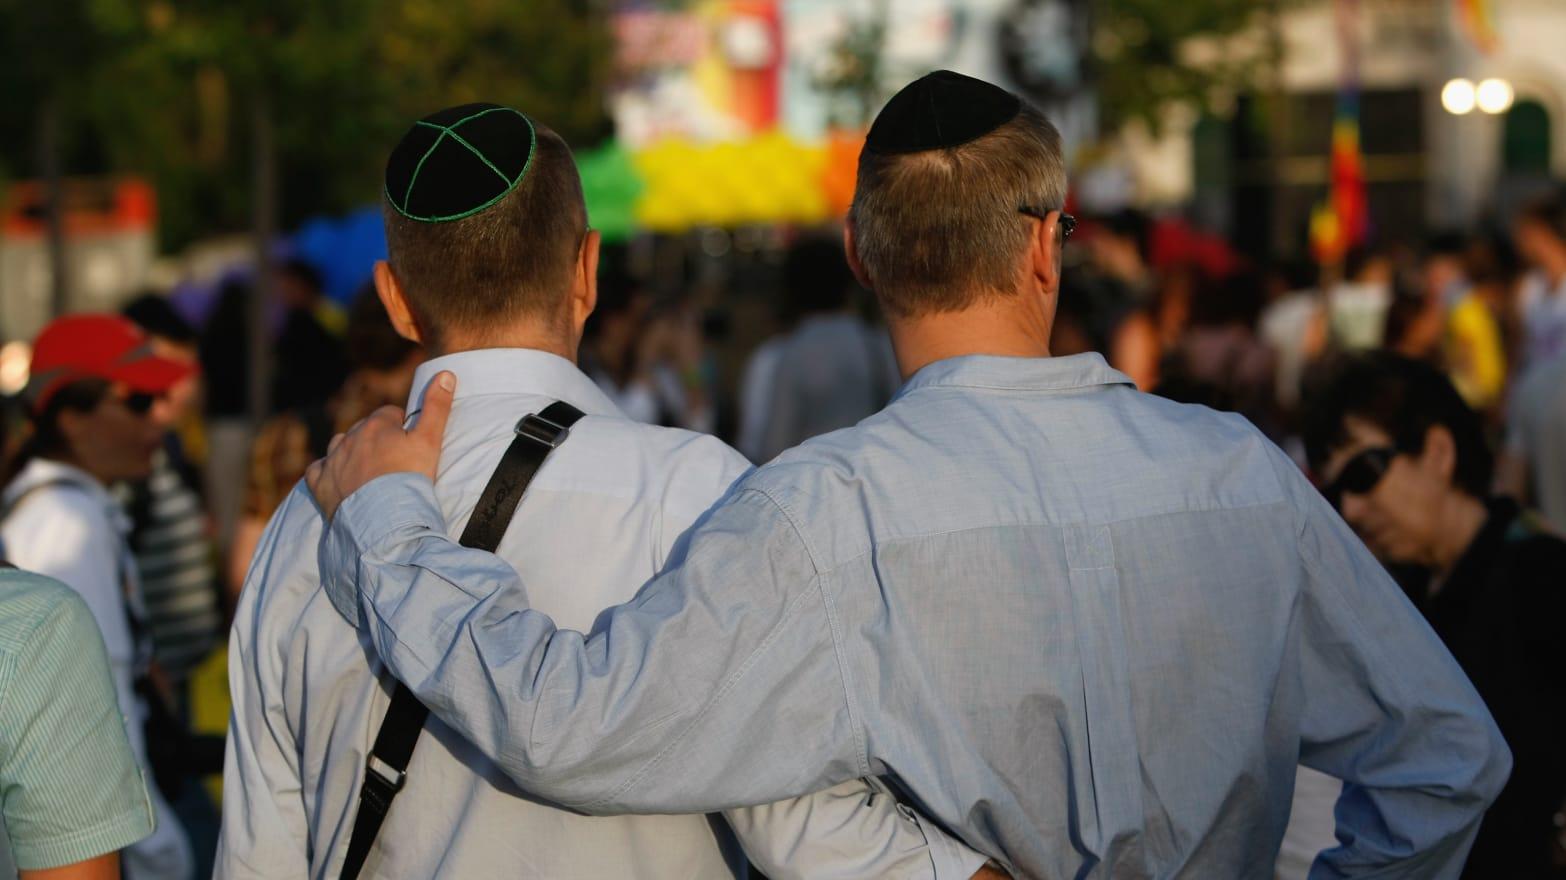 Conspiracy lesbian zionist